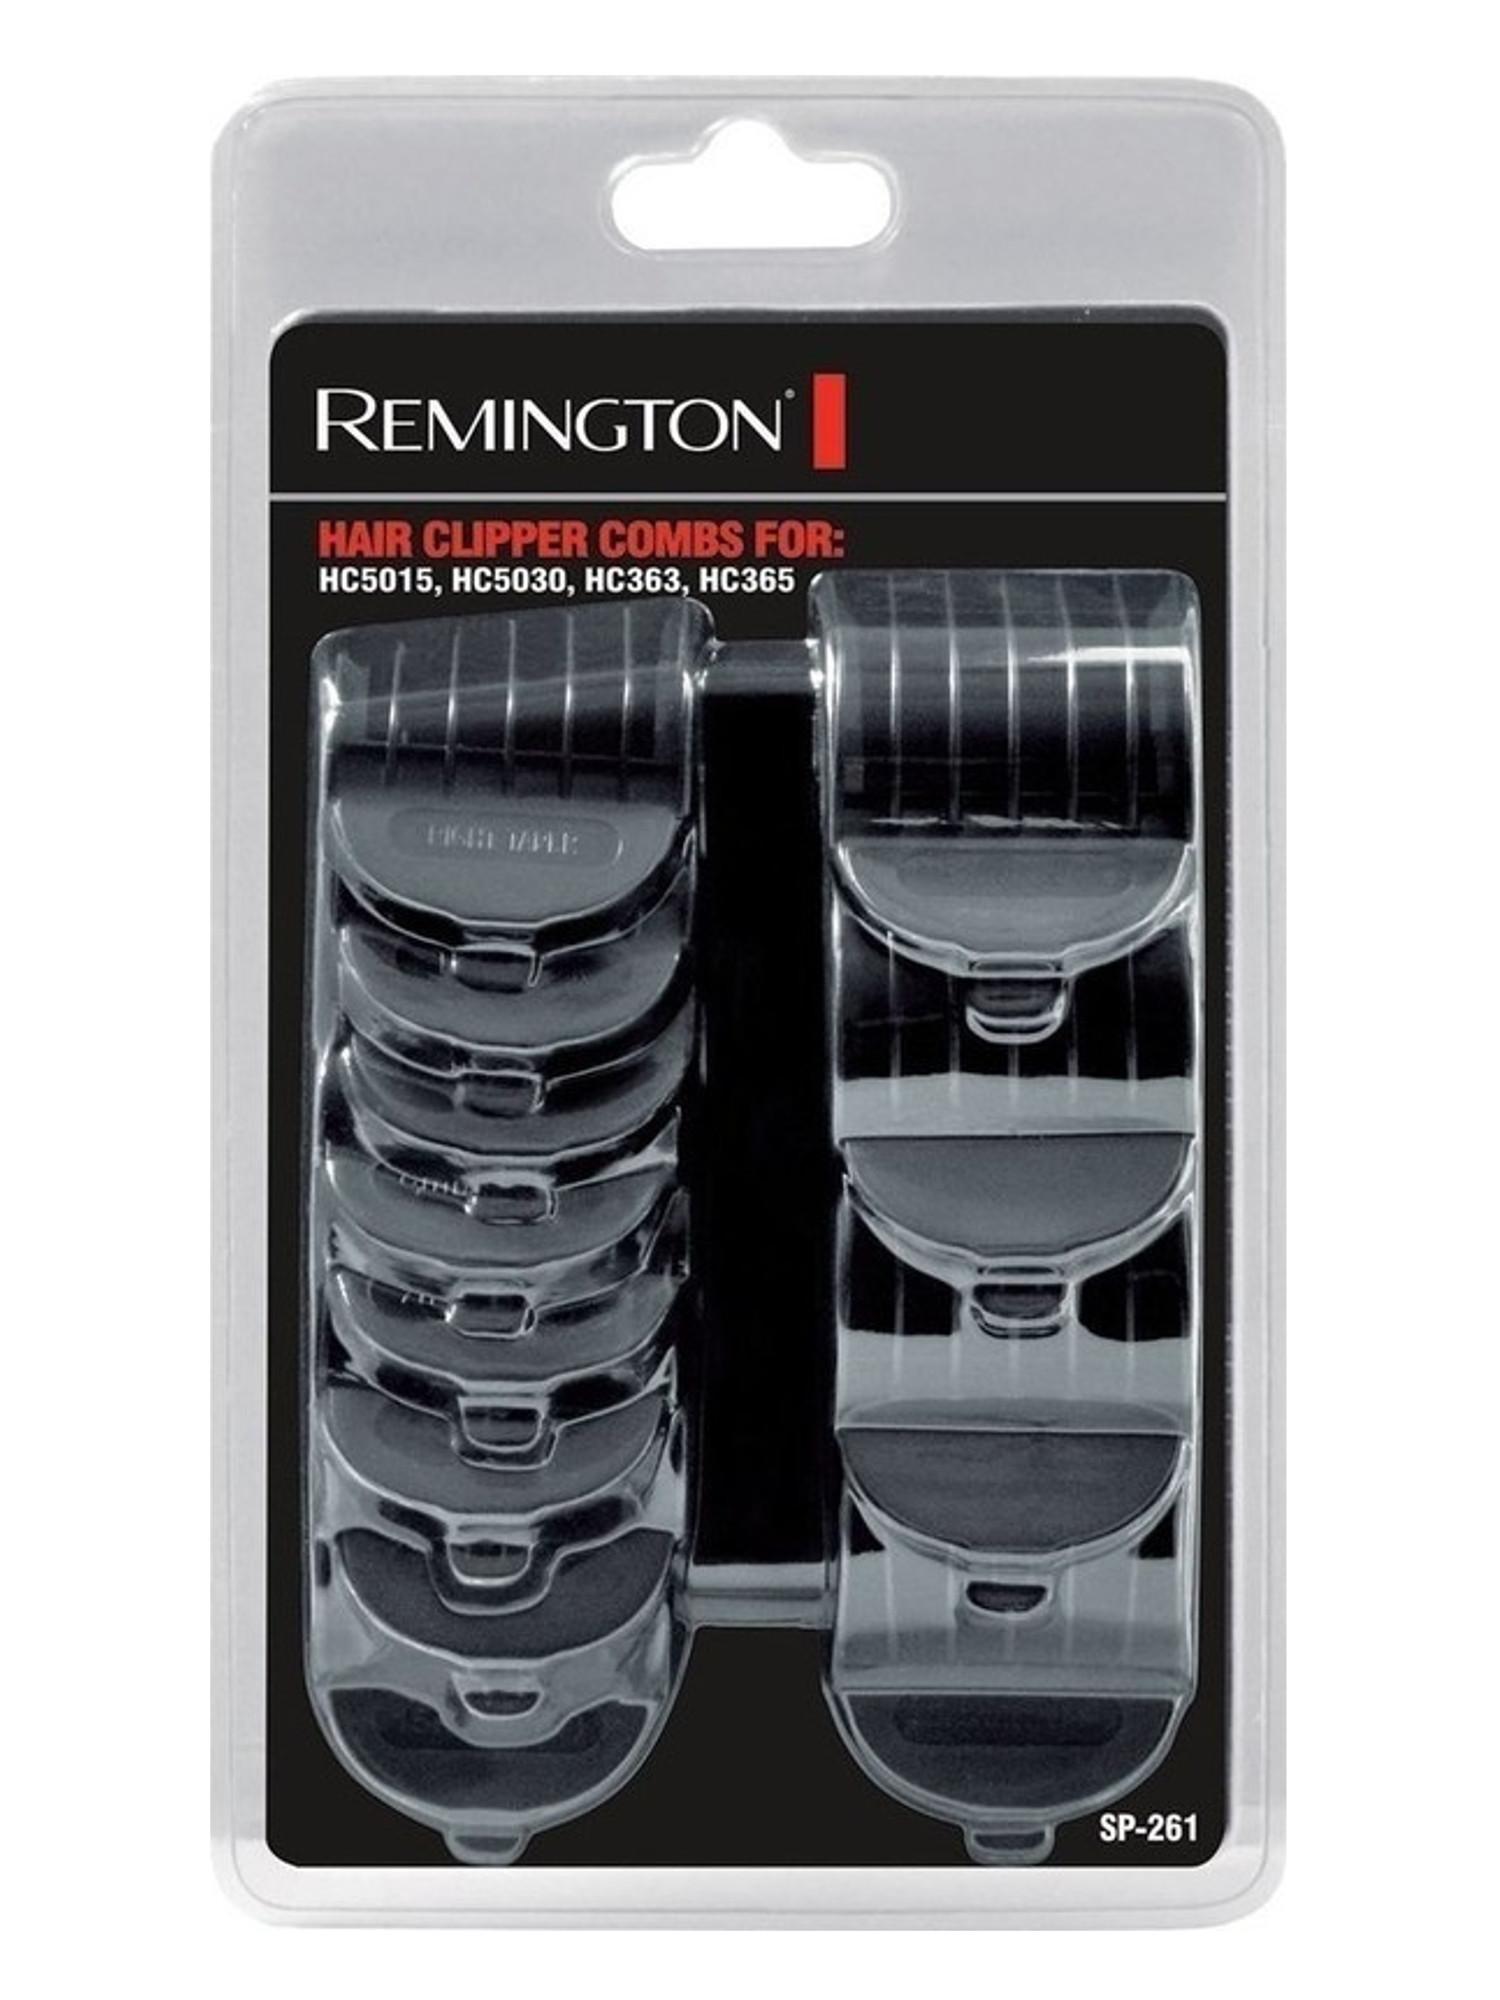 Sada náhradních nástavců Remington SP-261 (SP261) + DÁREK ZDARMA